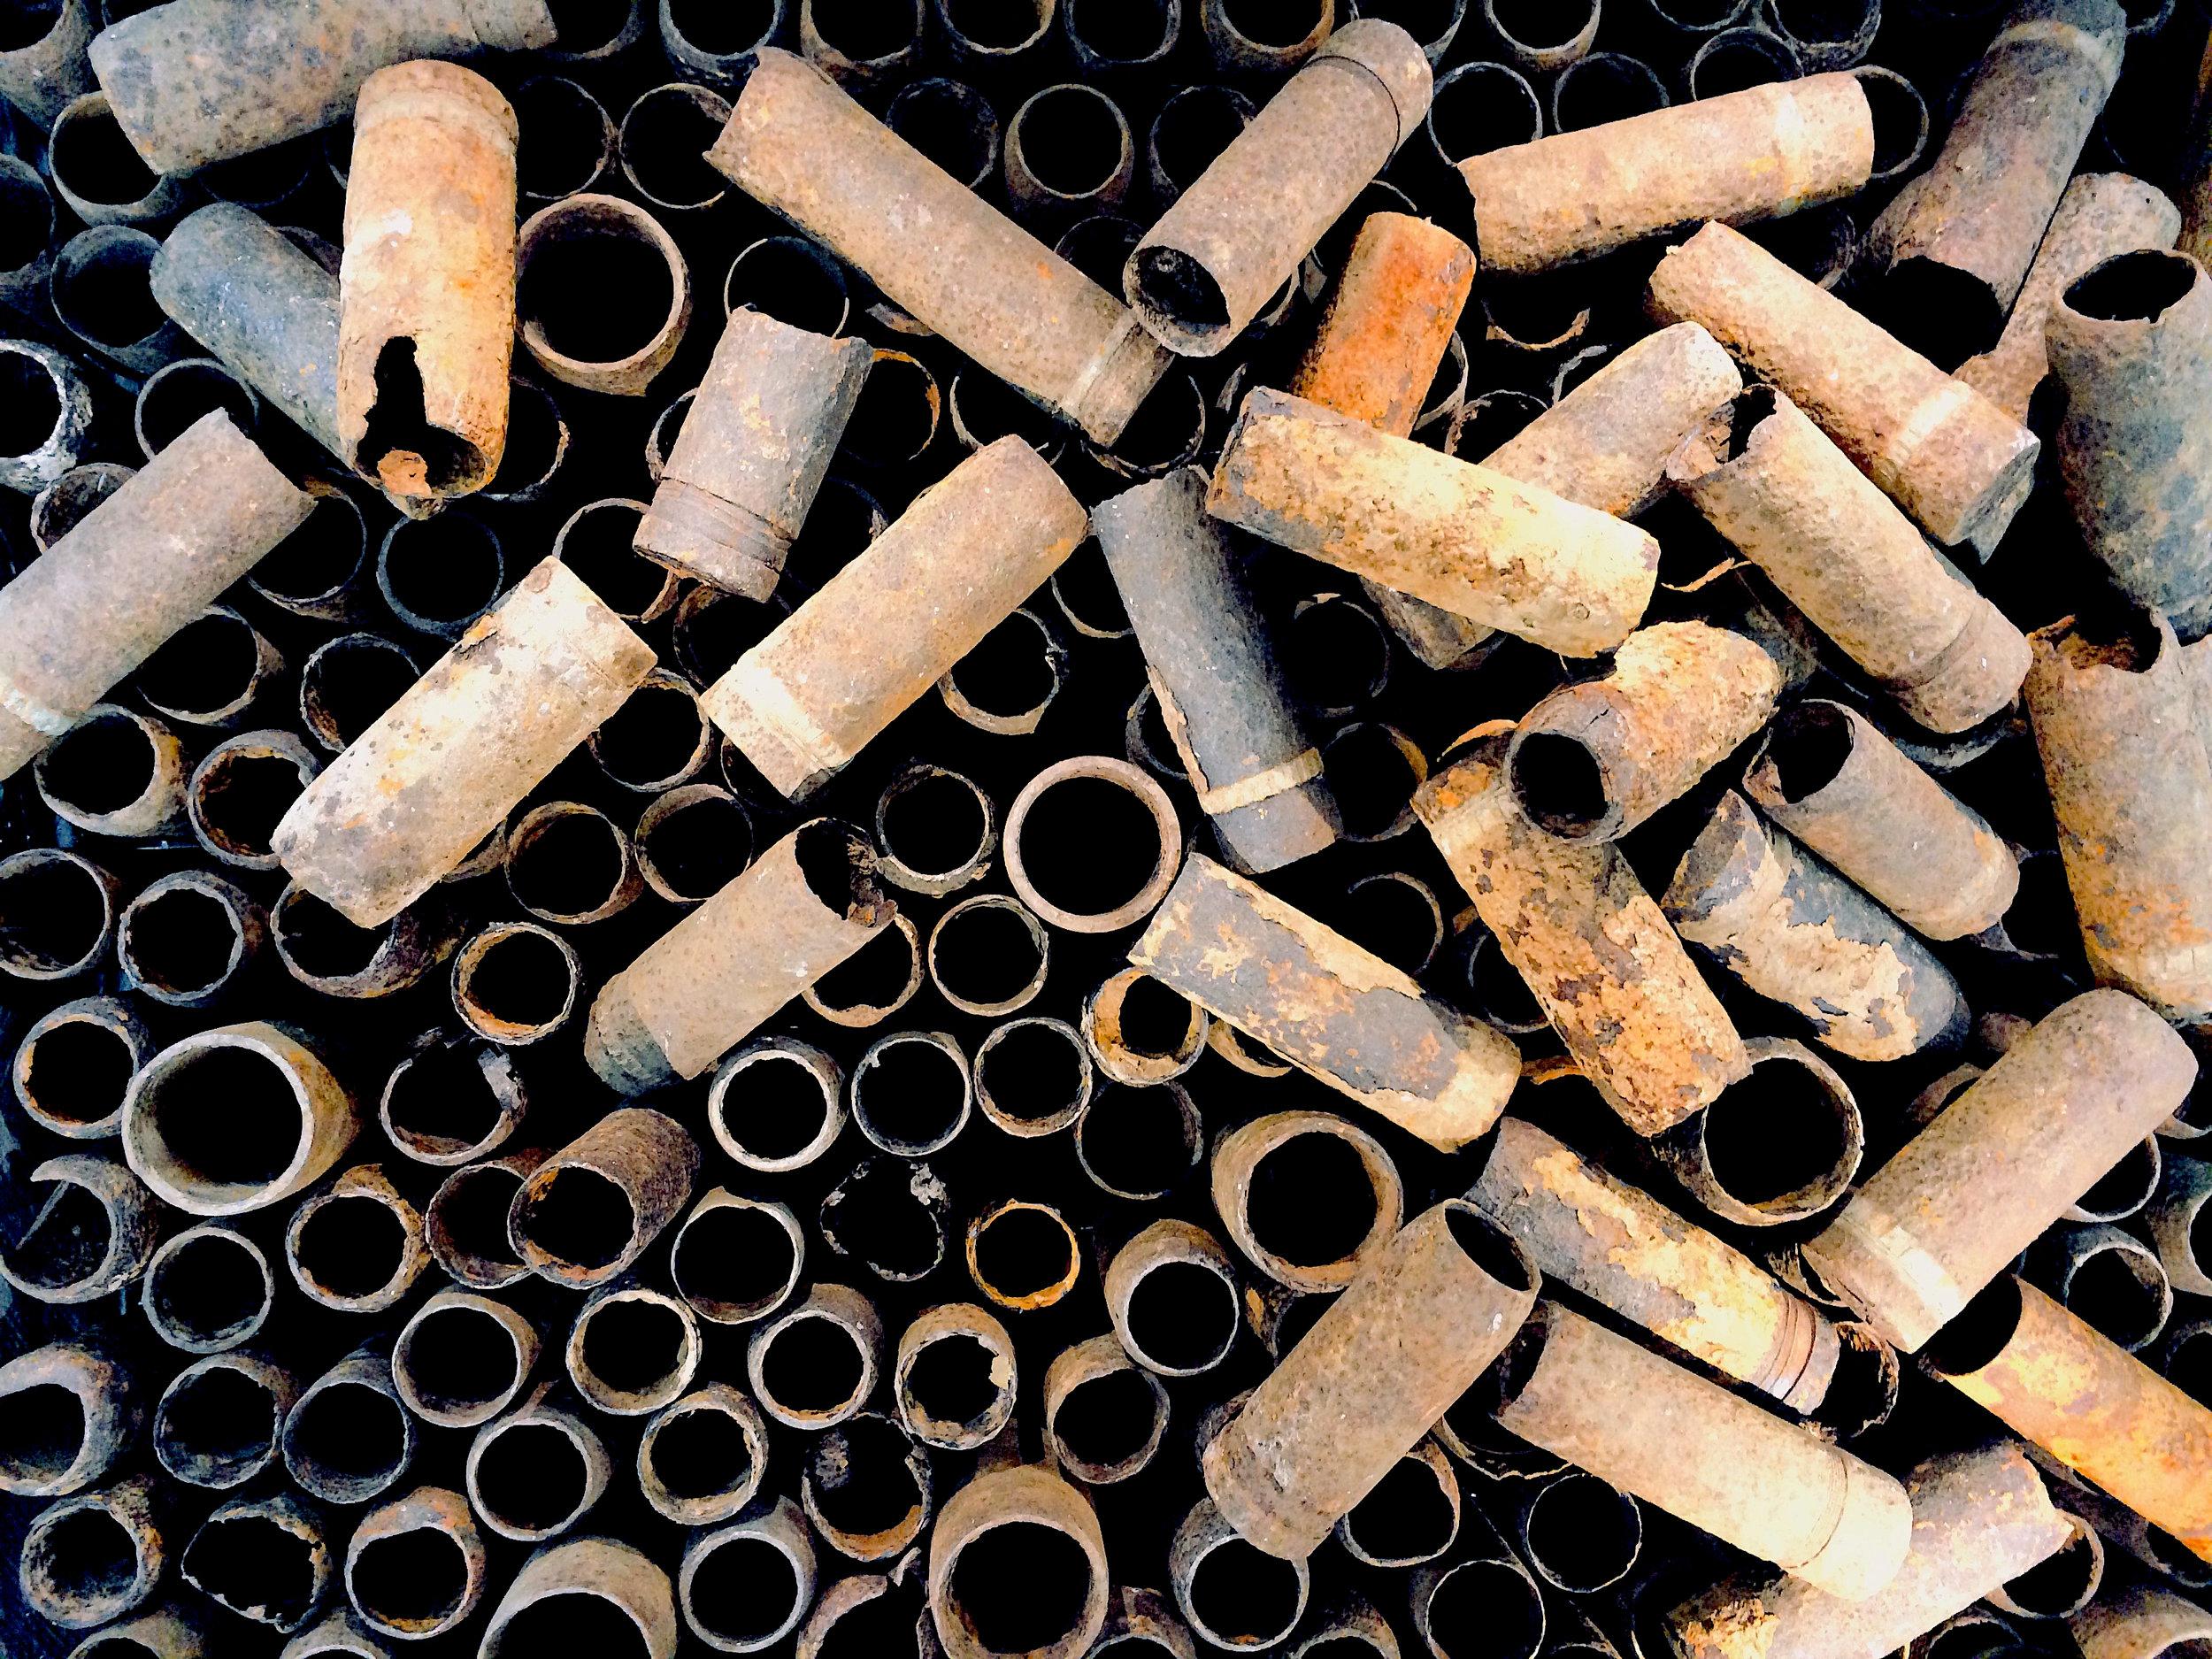 shell casings